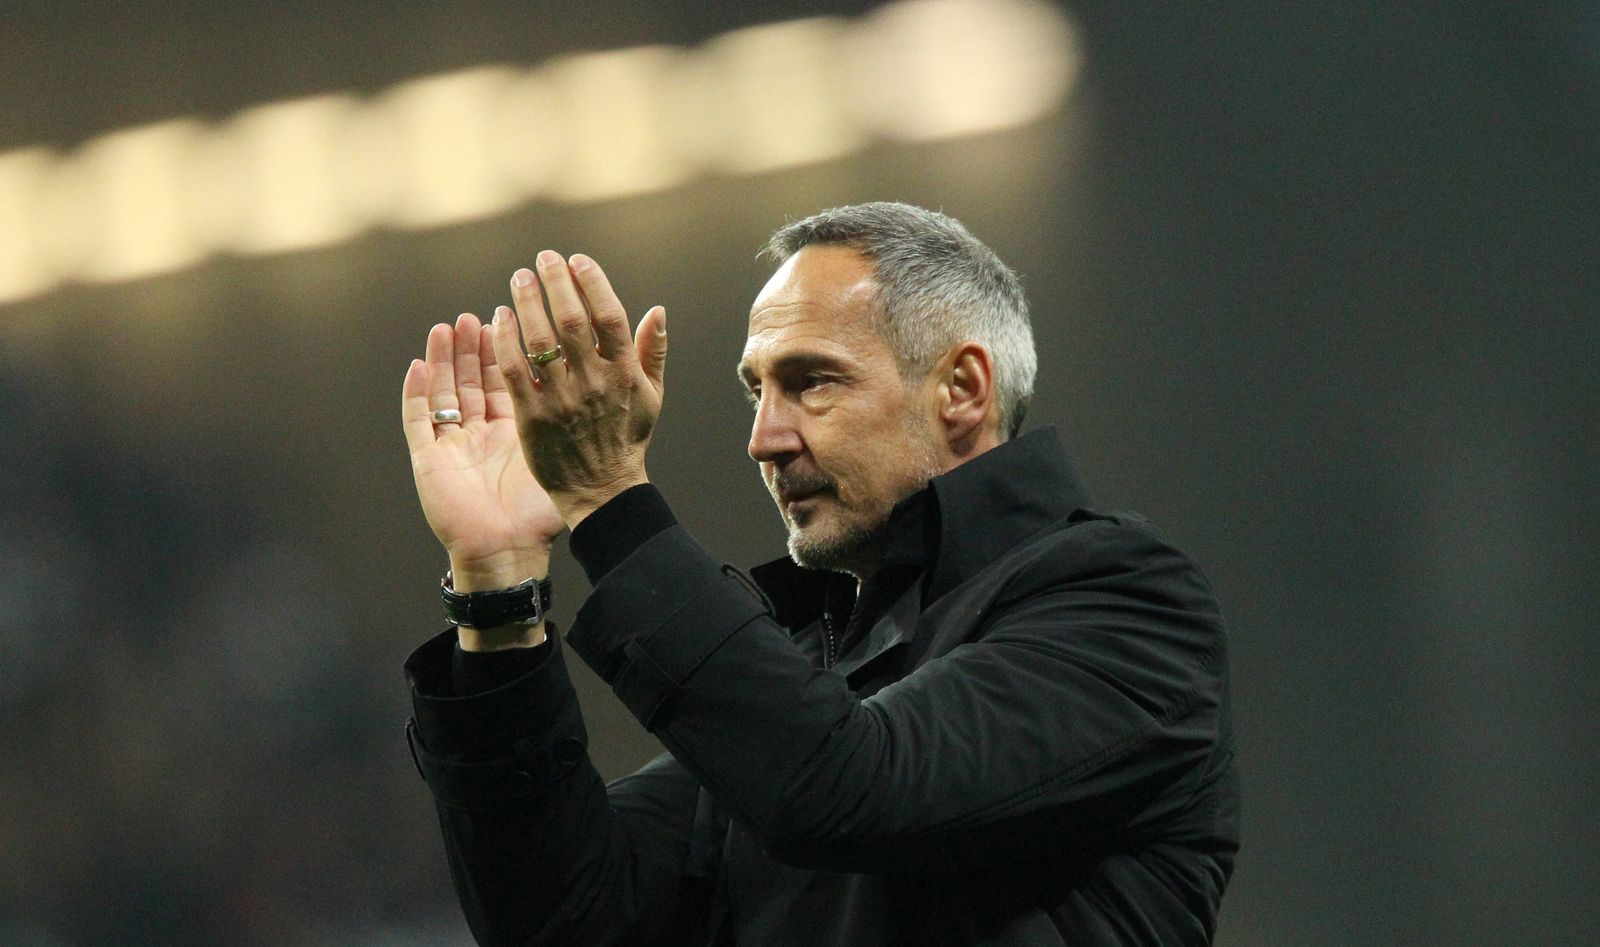 4 1 Sieg fuer Eintracht Frankfurt Adi Huetter Hütter Trainer Eintracht Frankfurt jubelt mit d